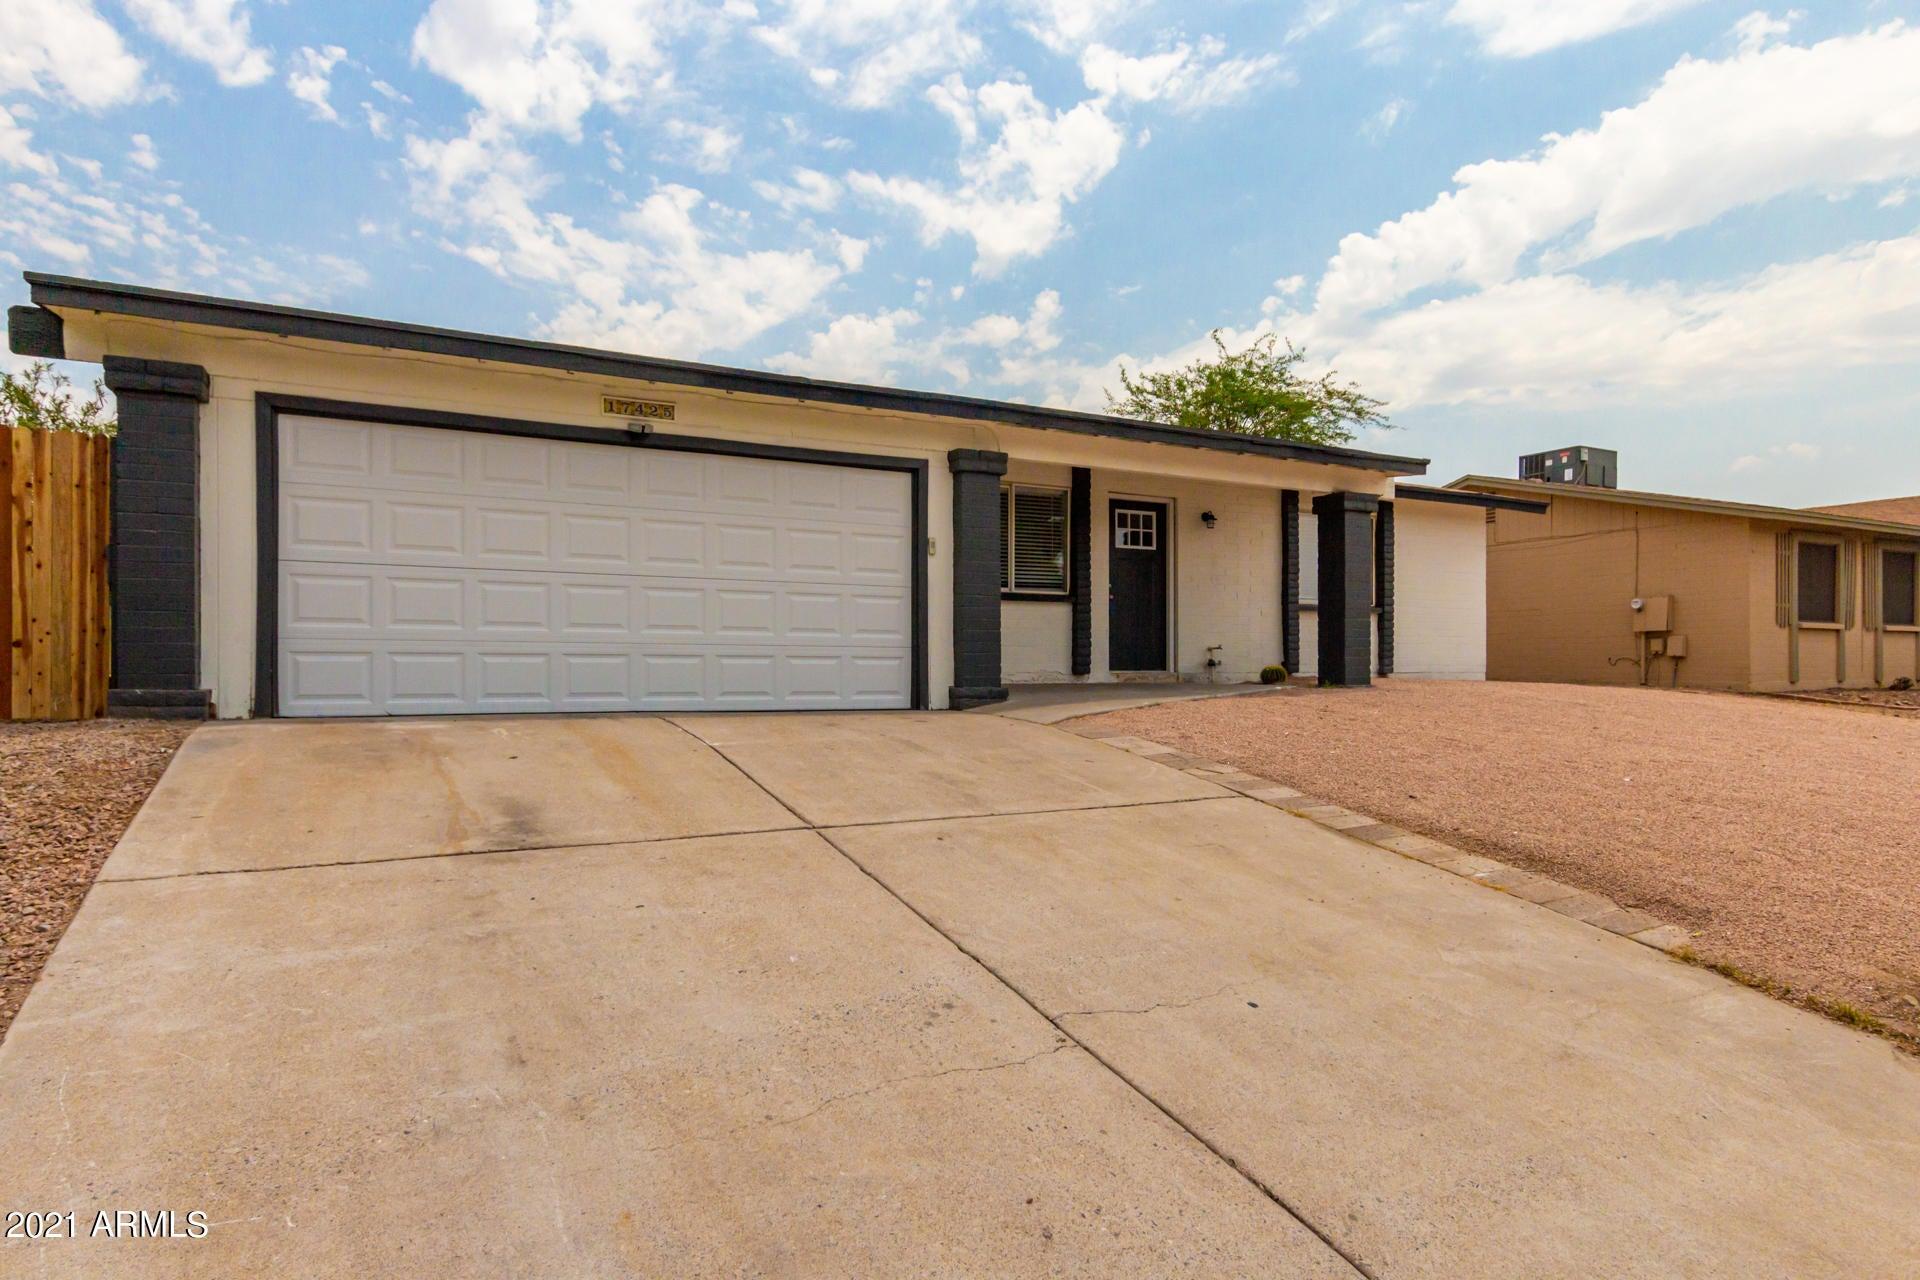 17425 N 8TH Avenue, Phoenix, AZ 85023